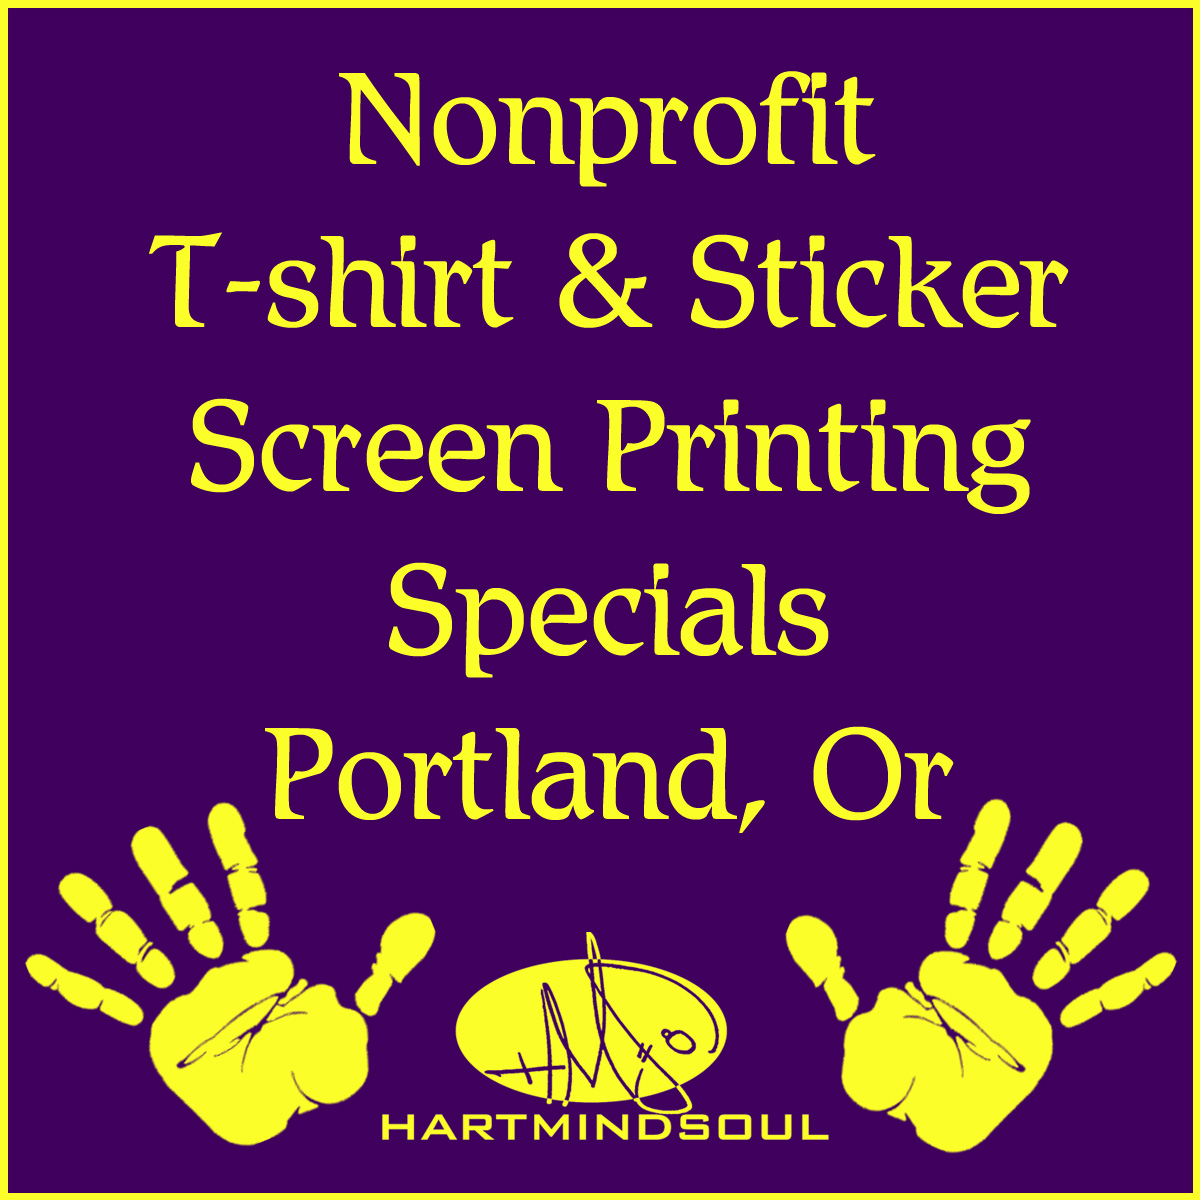 Nonprofit t shirt sticker specials portland - WORKING